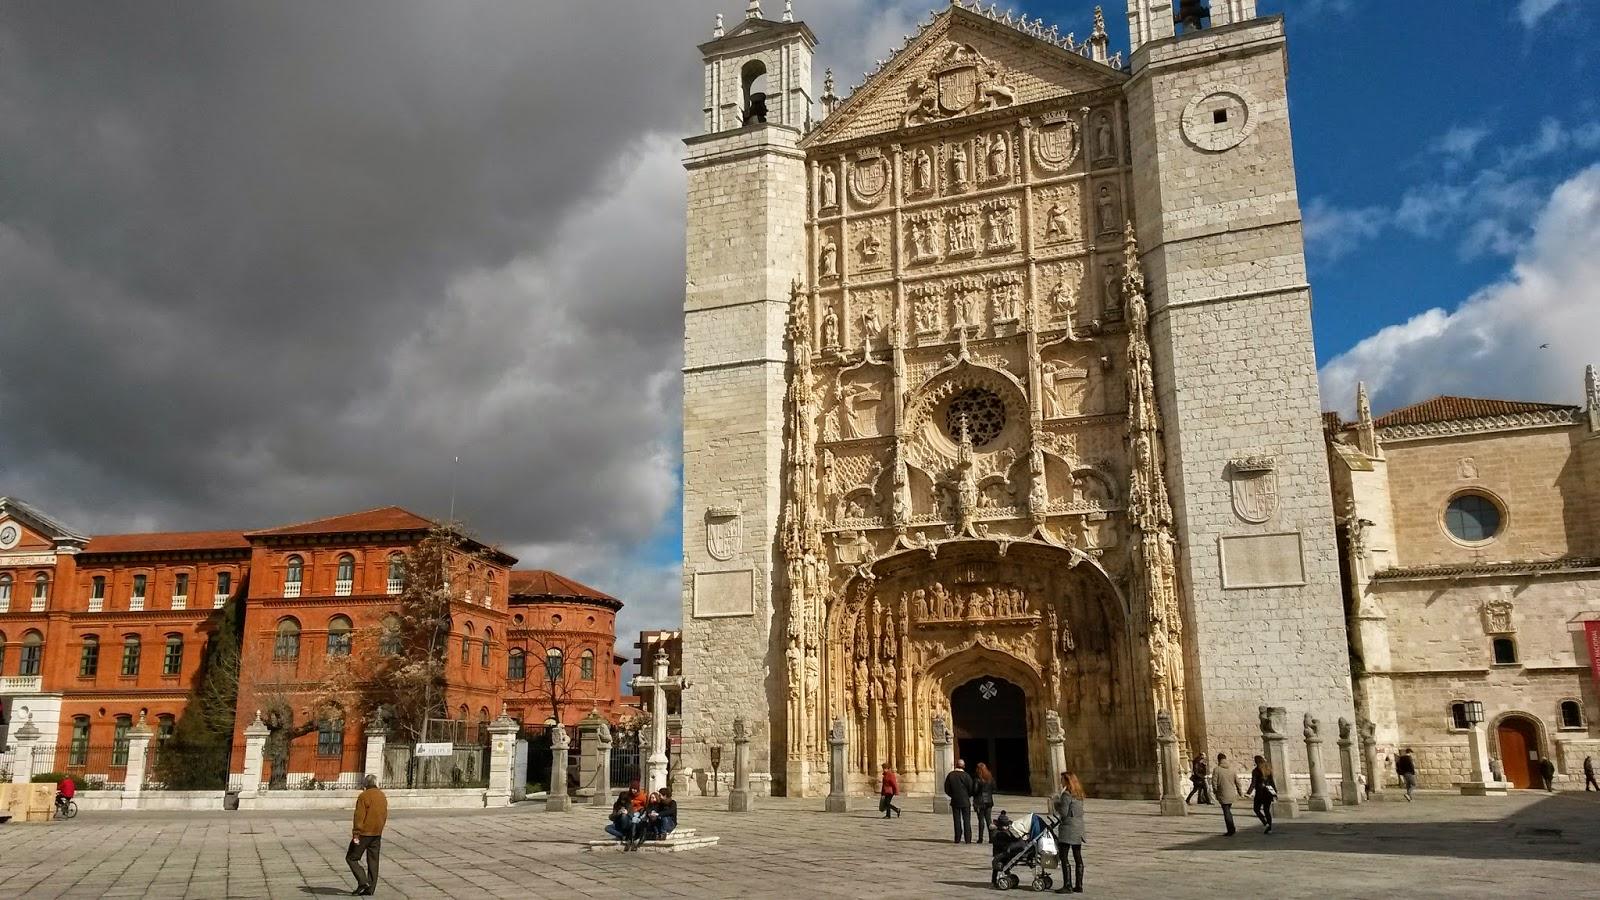 Iglesia de San Pablo, famosa por su imponente fachada decorada con esculturas.